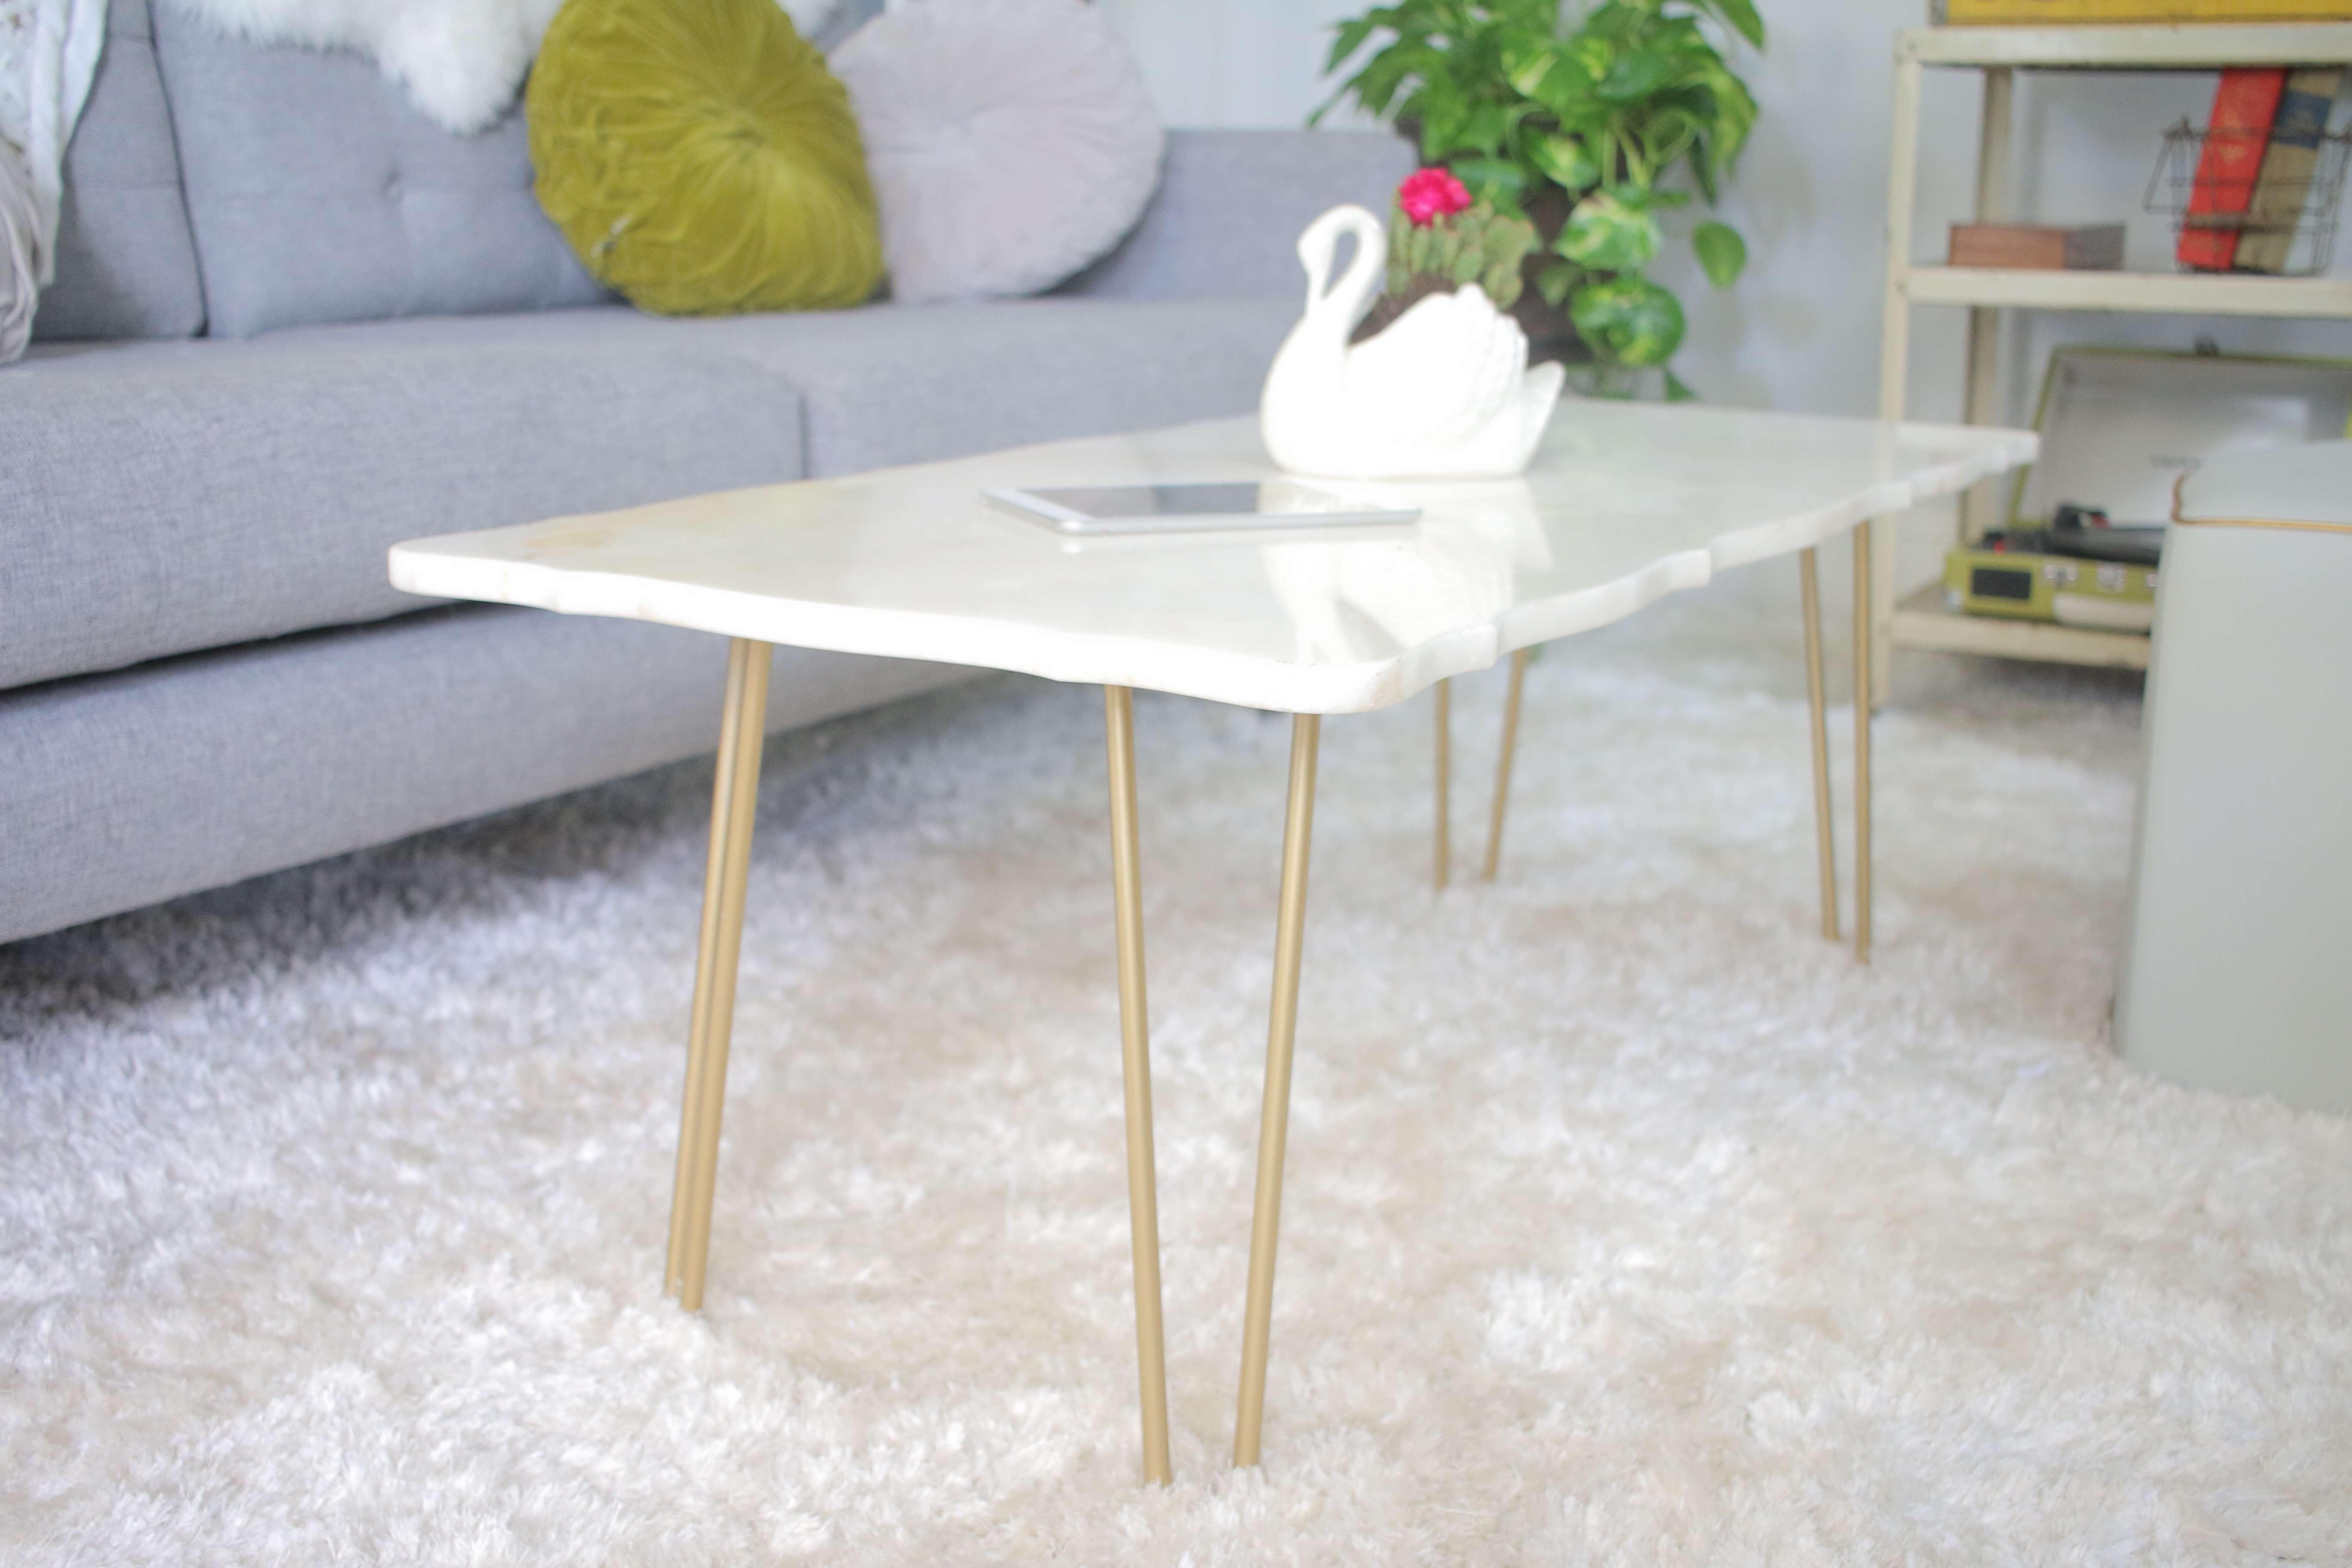 Popular Marble Coffee Tables Regarding Diy: Marble Coffee Table (View 20 of 20)